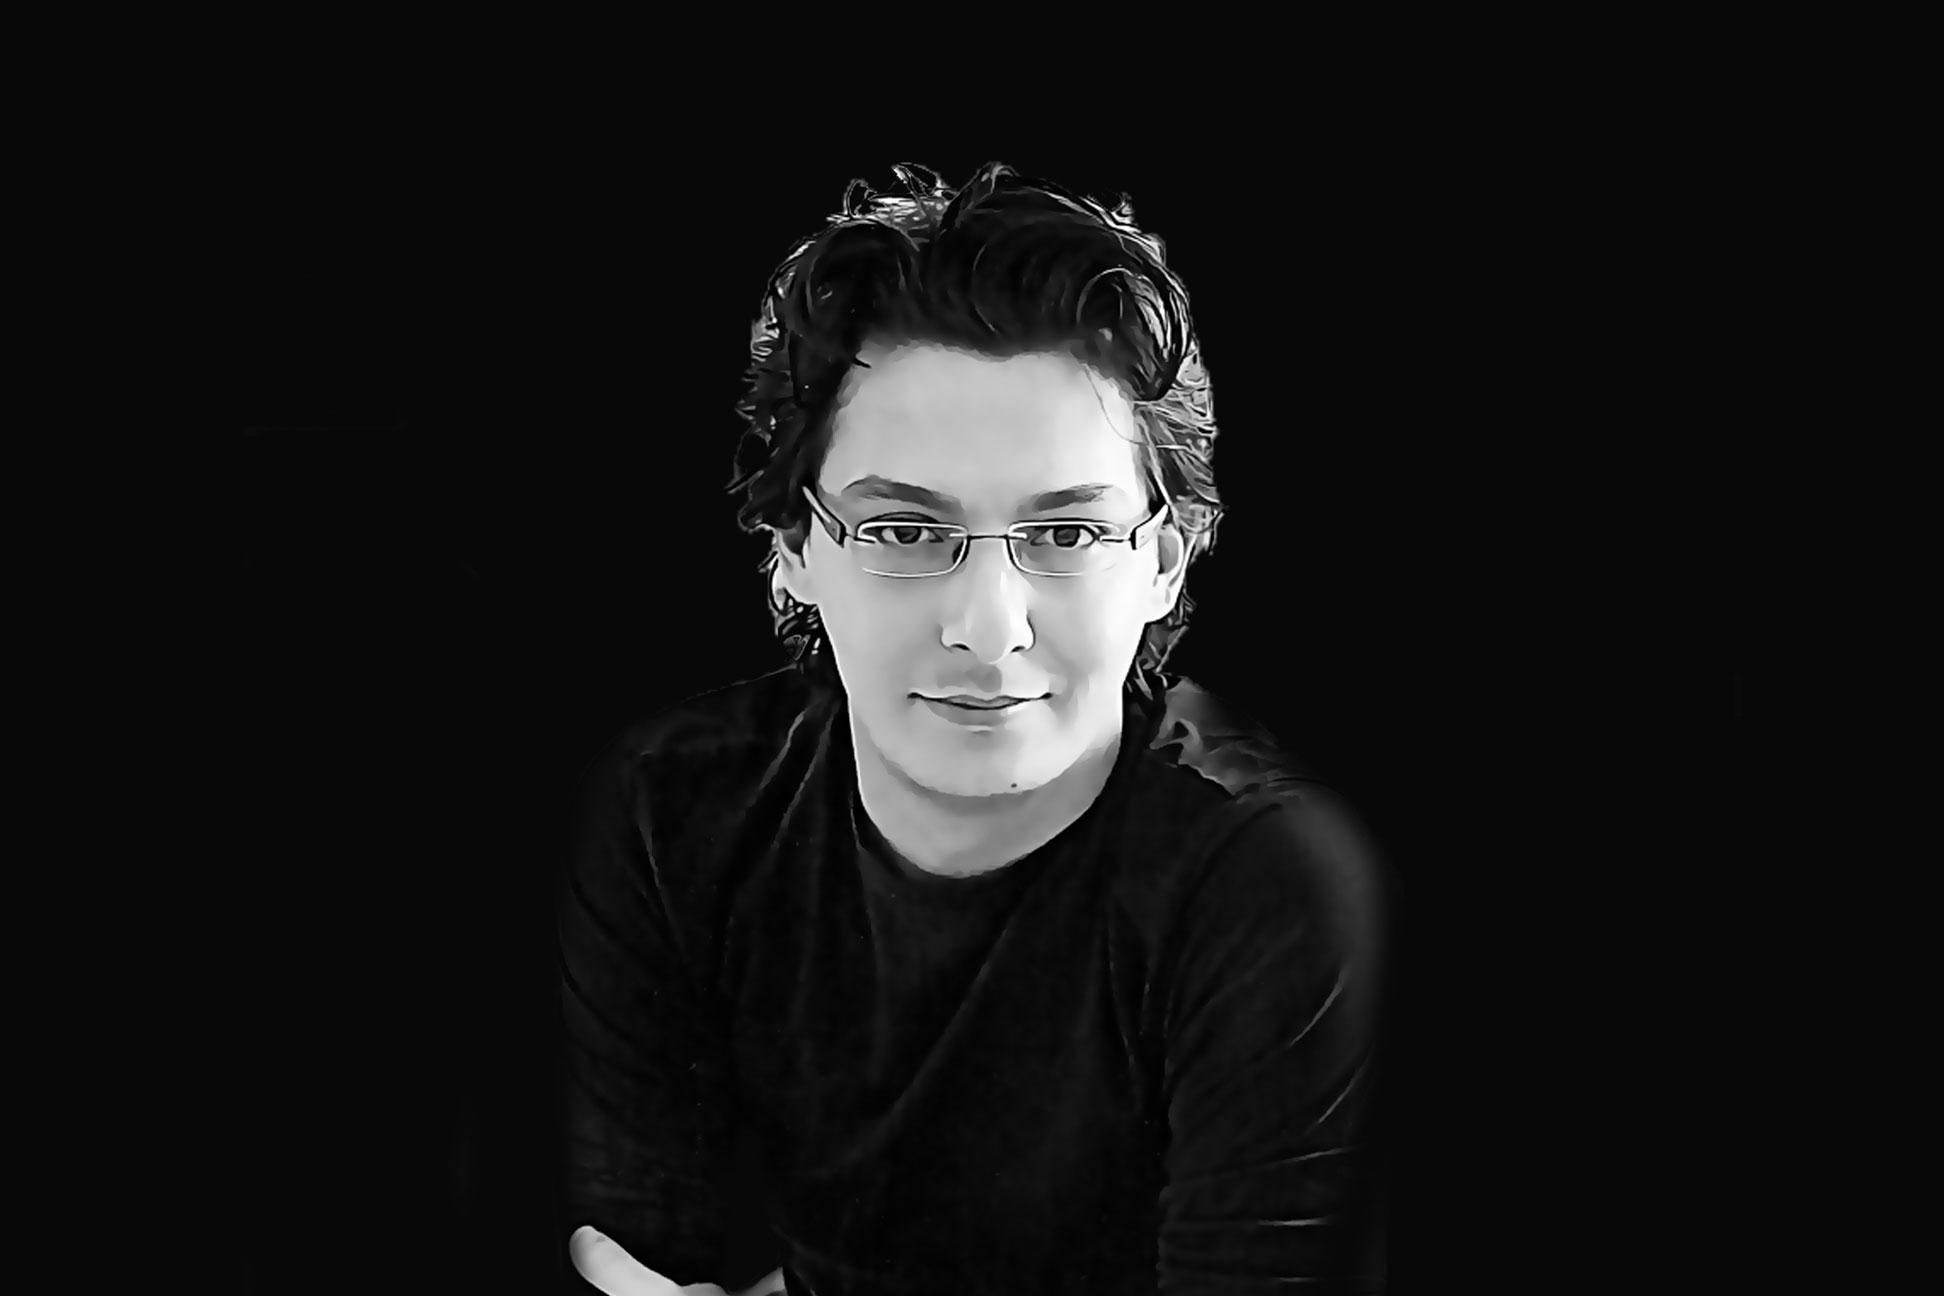 Shadi Al Hroub | VEGA Awards Winner